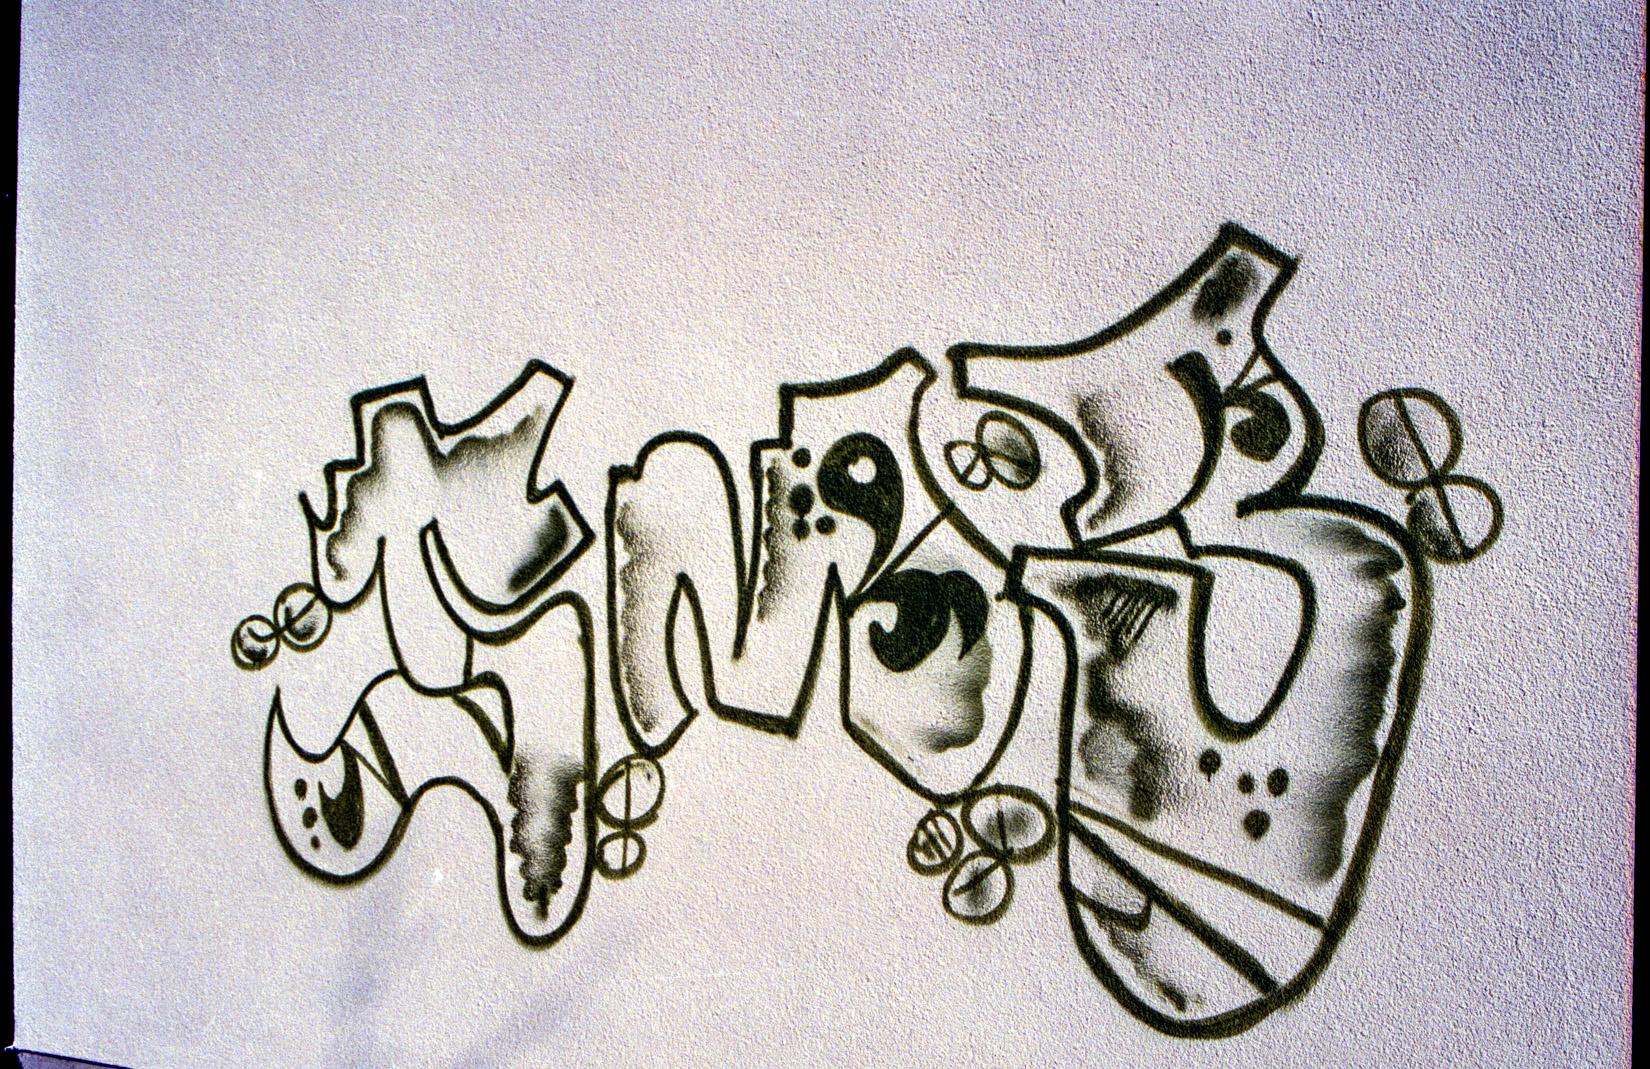 Frankfurt_Graffiti_1988_1989_H88_FRC (10 von 25)